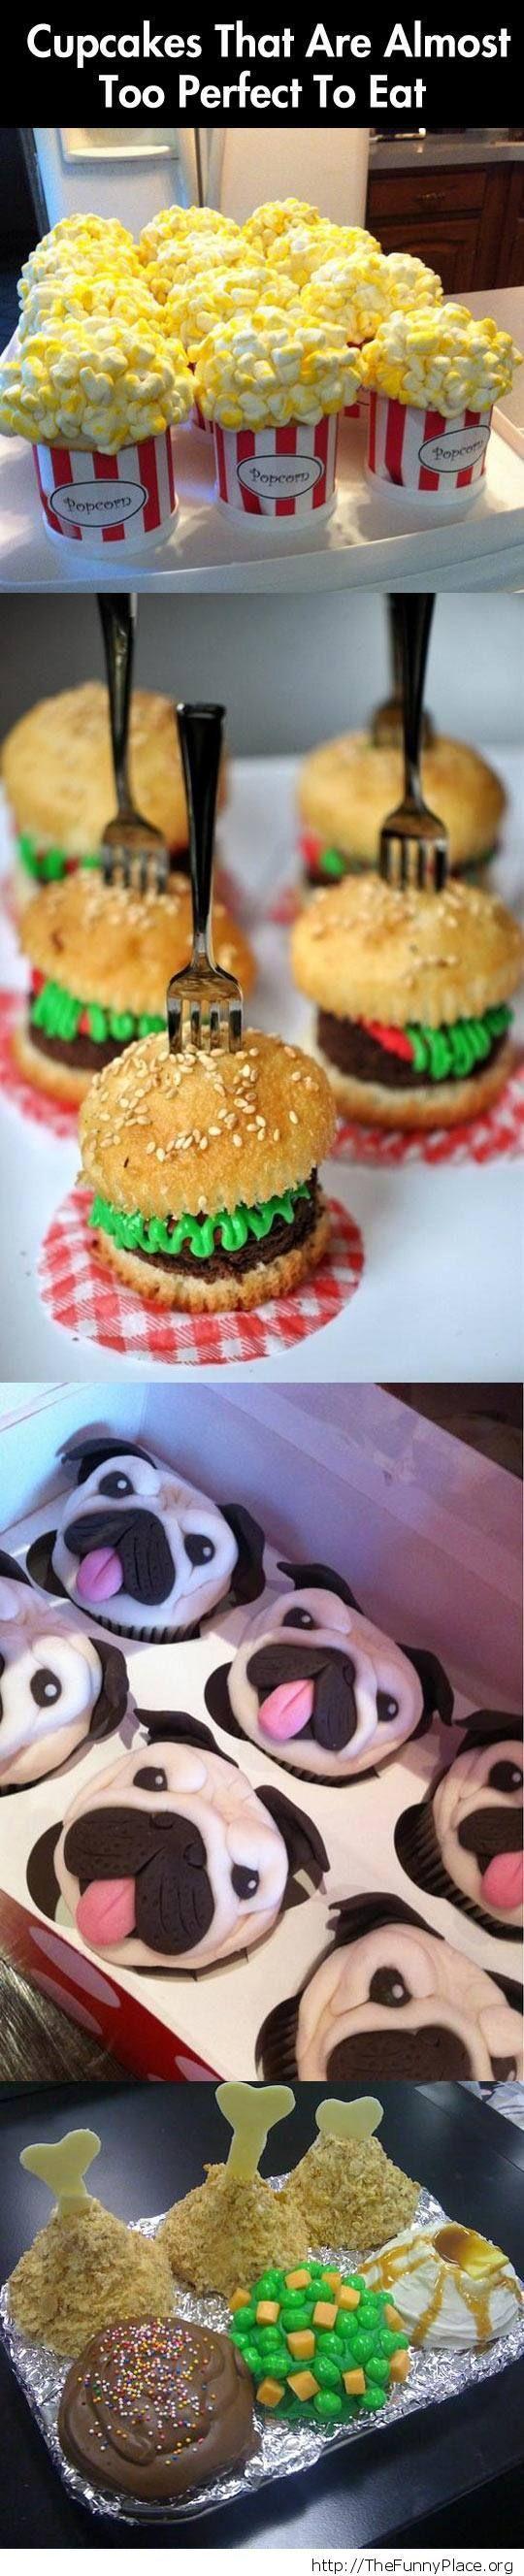 Cupcake art